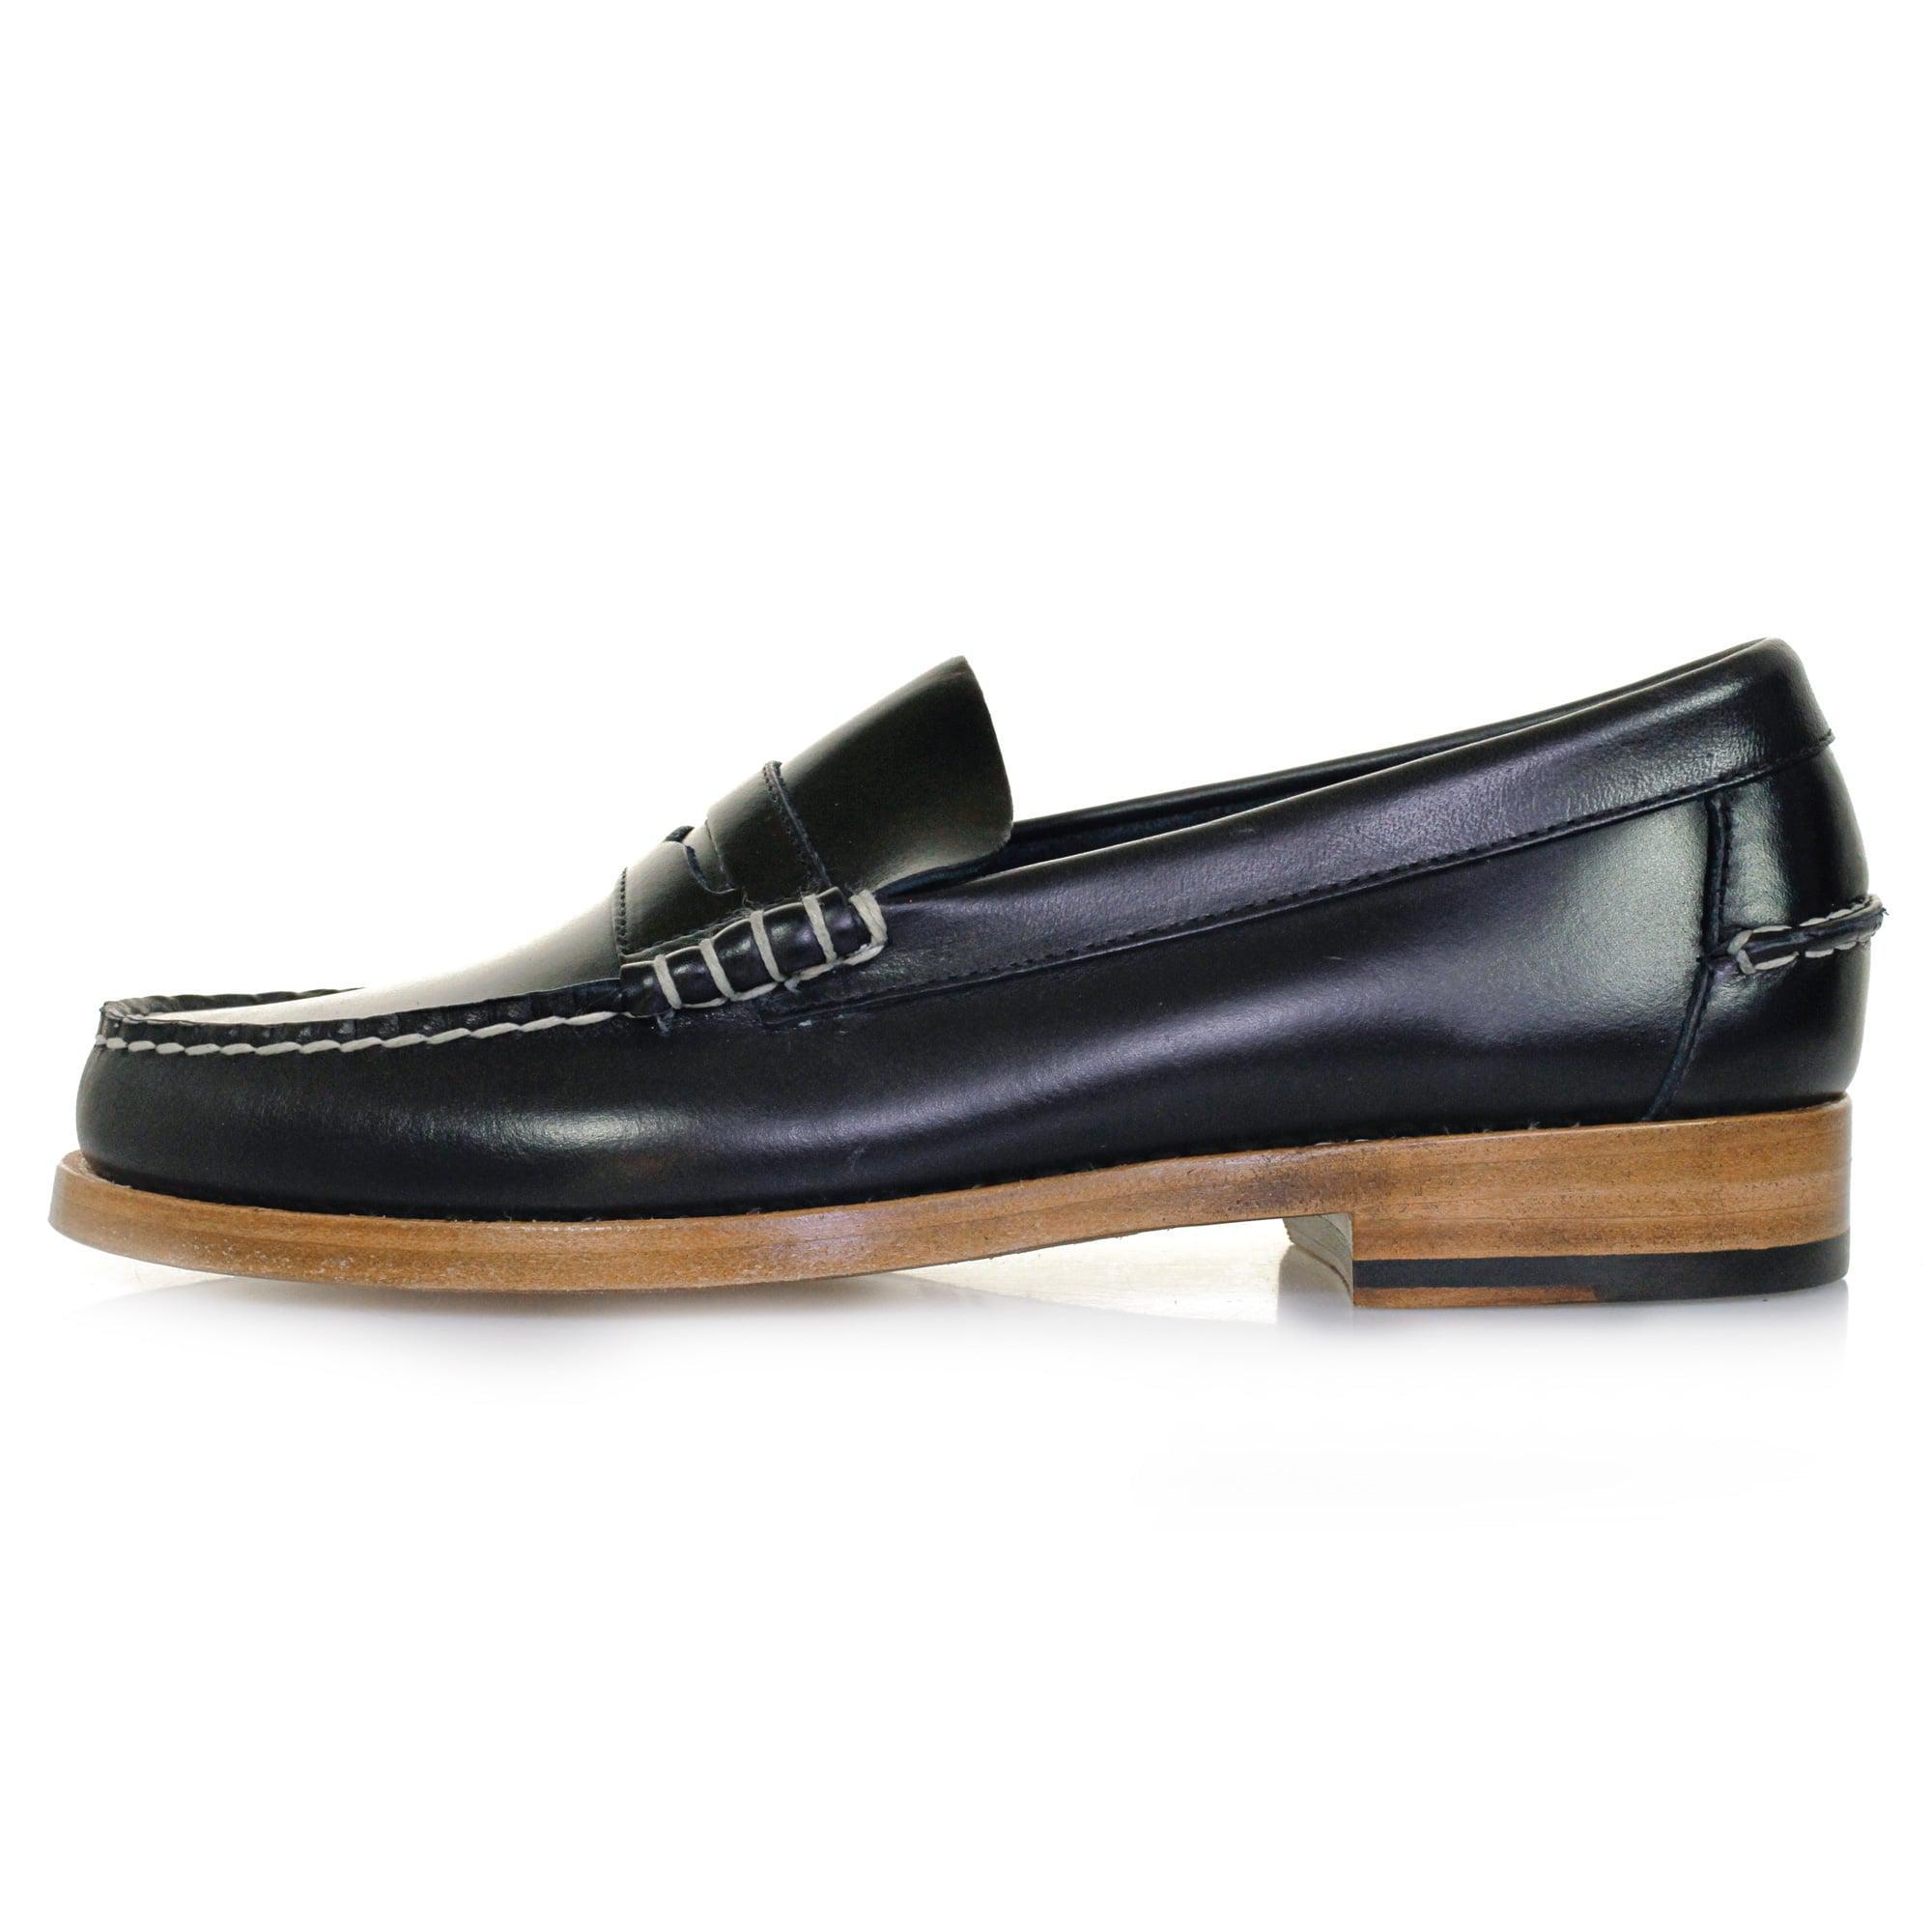 3e54ad0d892 Sebago - Blue Legacy Penny Navy Loafer Shoe for Men - Lyst. View fullscreen